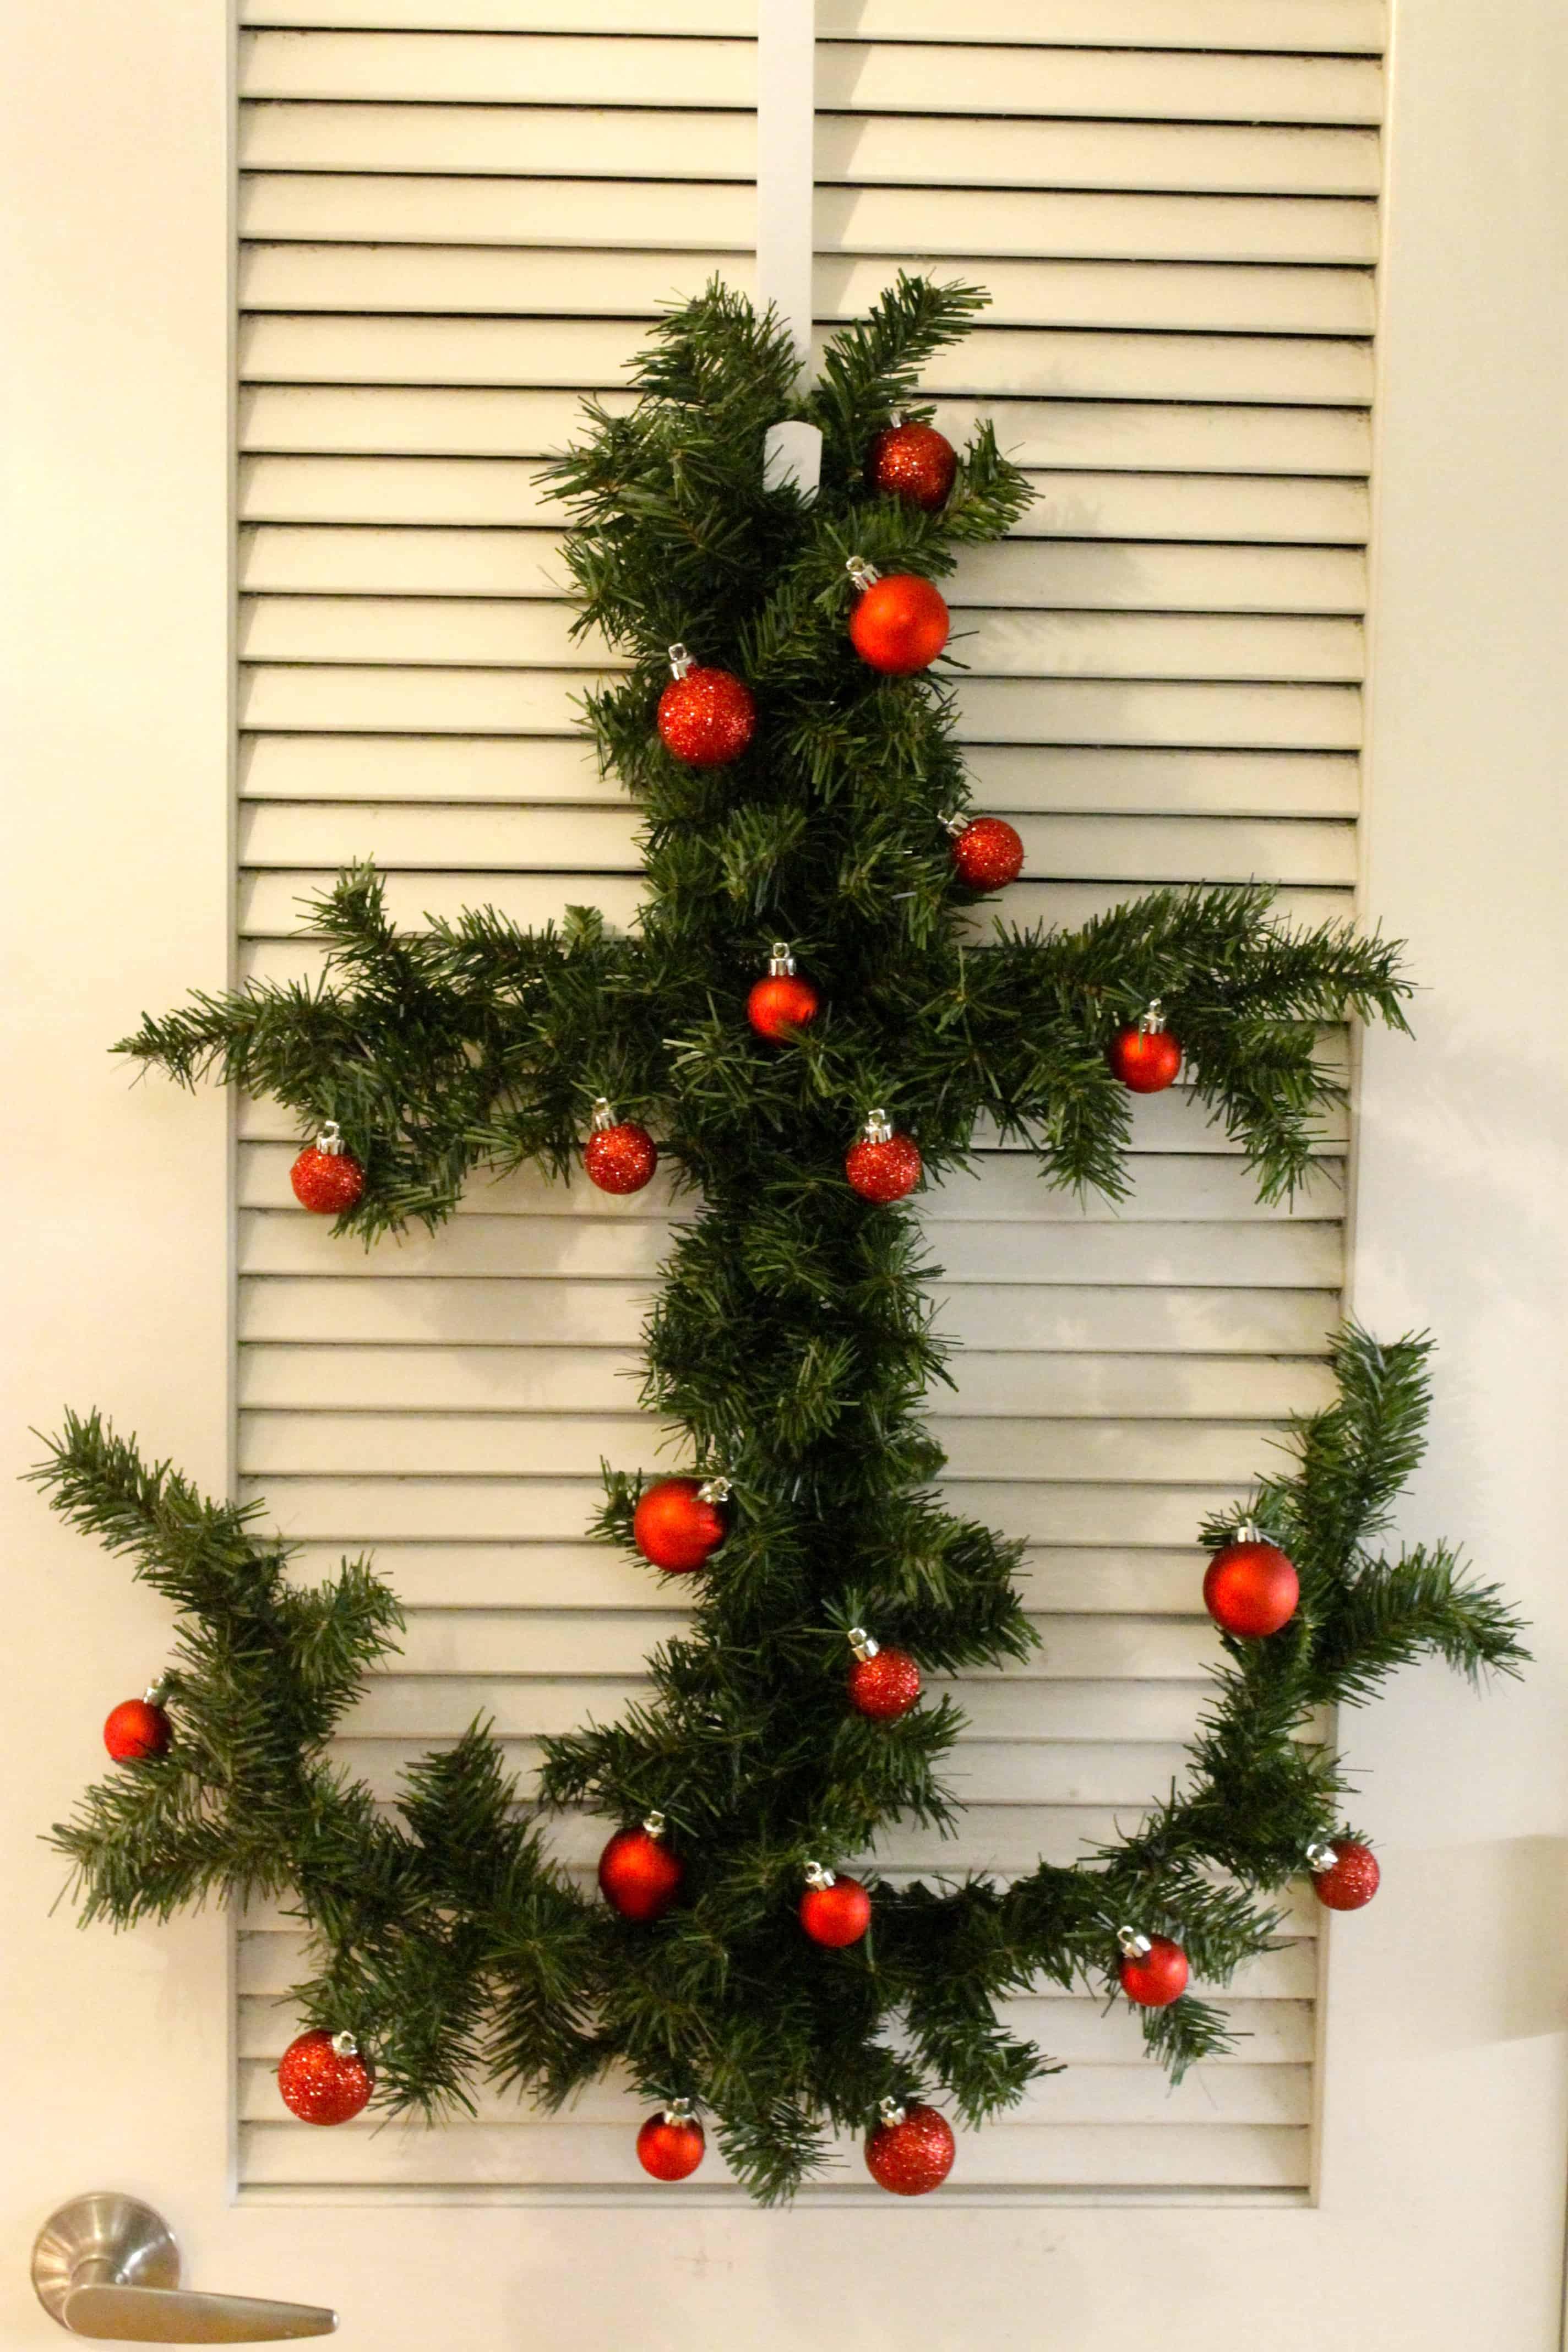 Coastal Christmas: DIY Anchor Garland Holiday Wreath